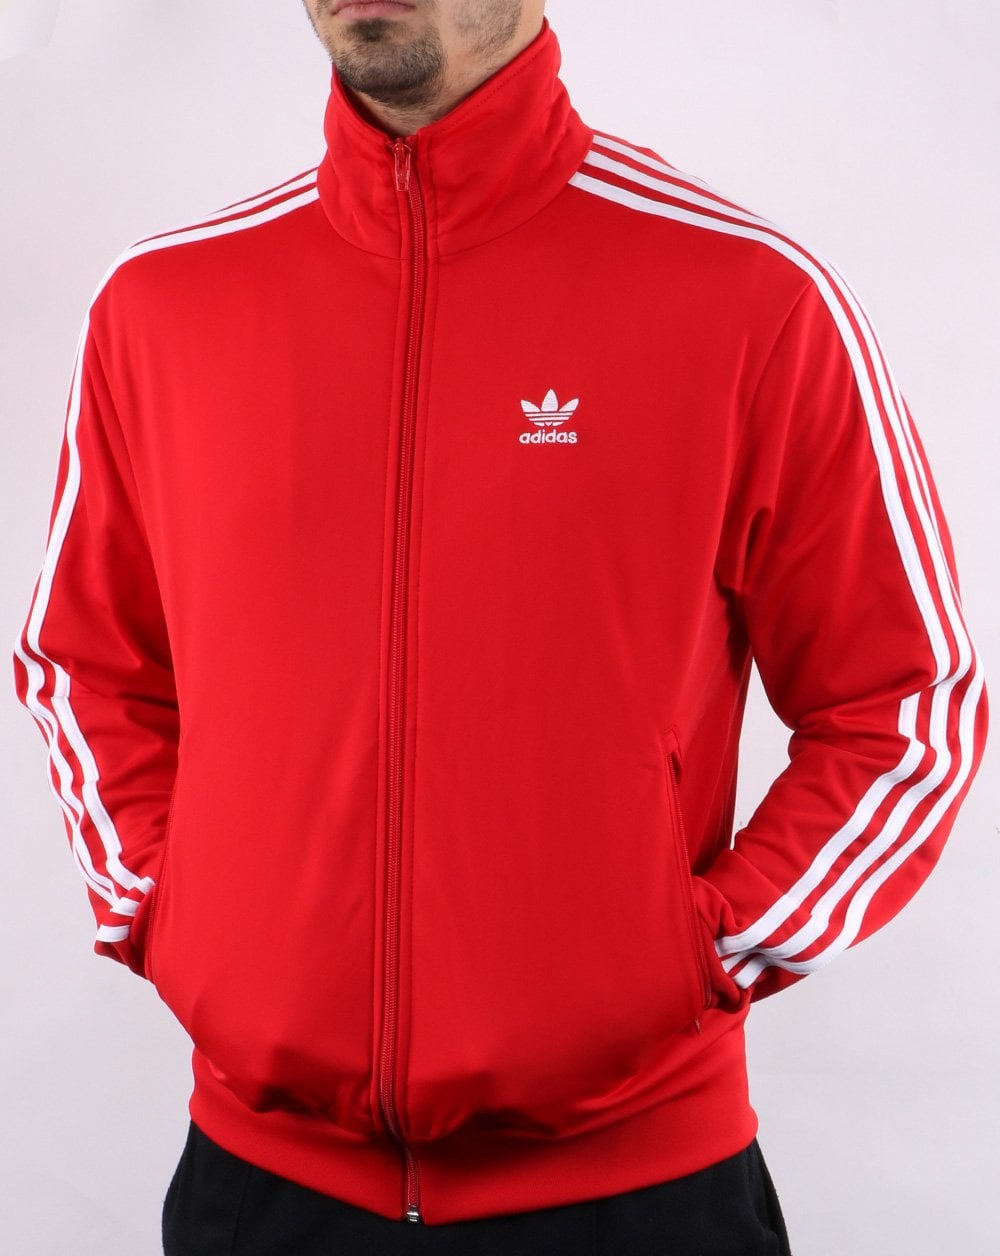 Ataque de nervios De hecho Injusticia  firebird adidas track jacket Online Shopping for Women, Men, Kids Fashion &  Lifestyle|Free Delivery & Returns! -